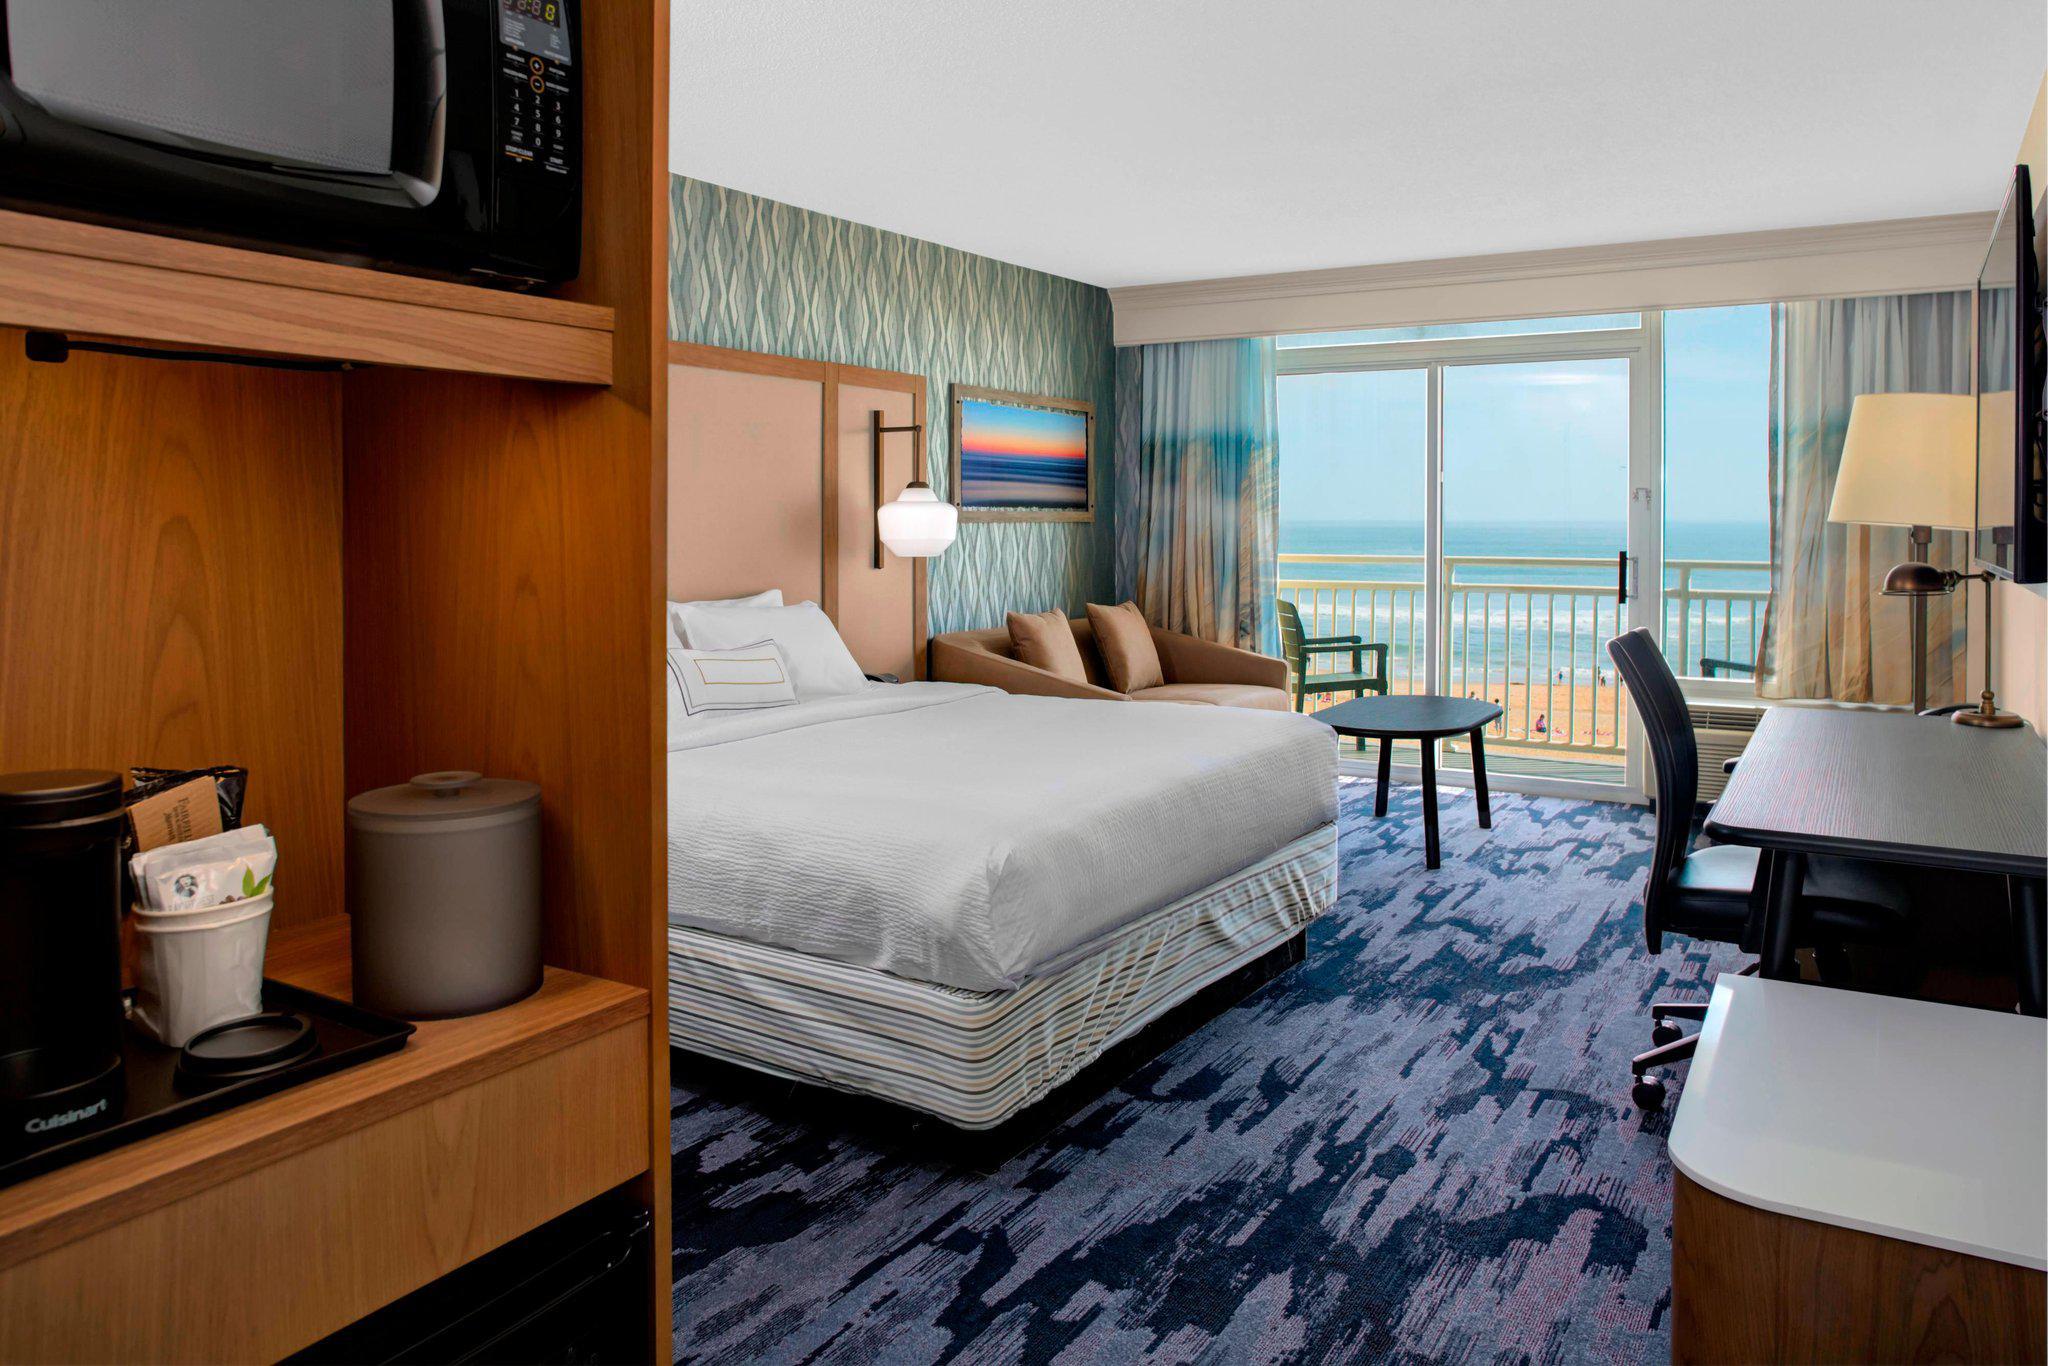 Fairfield Inn & Suites by Marriott Virginia Beach Oceanfront